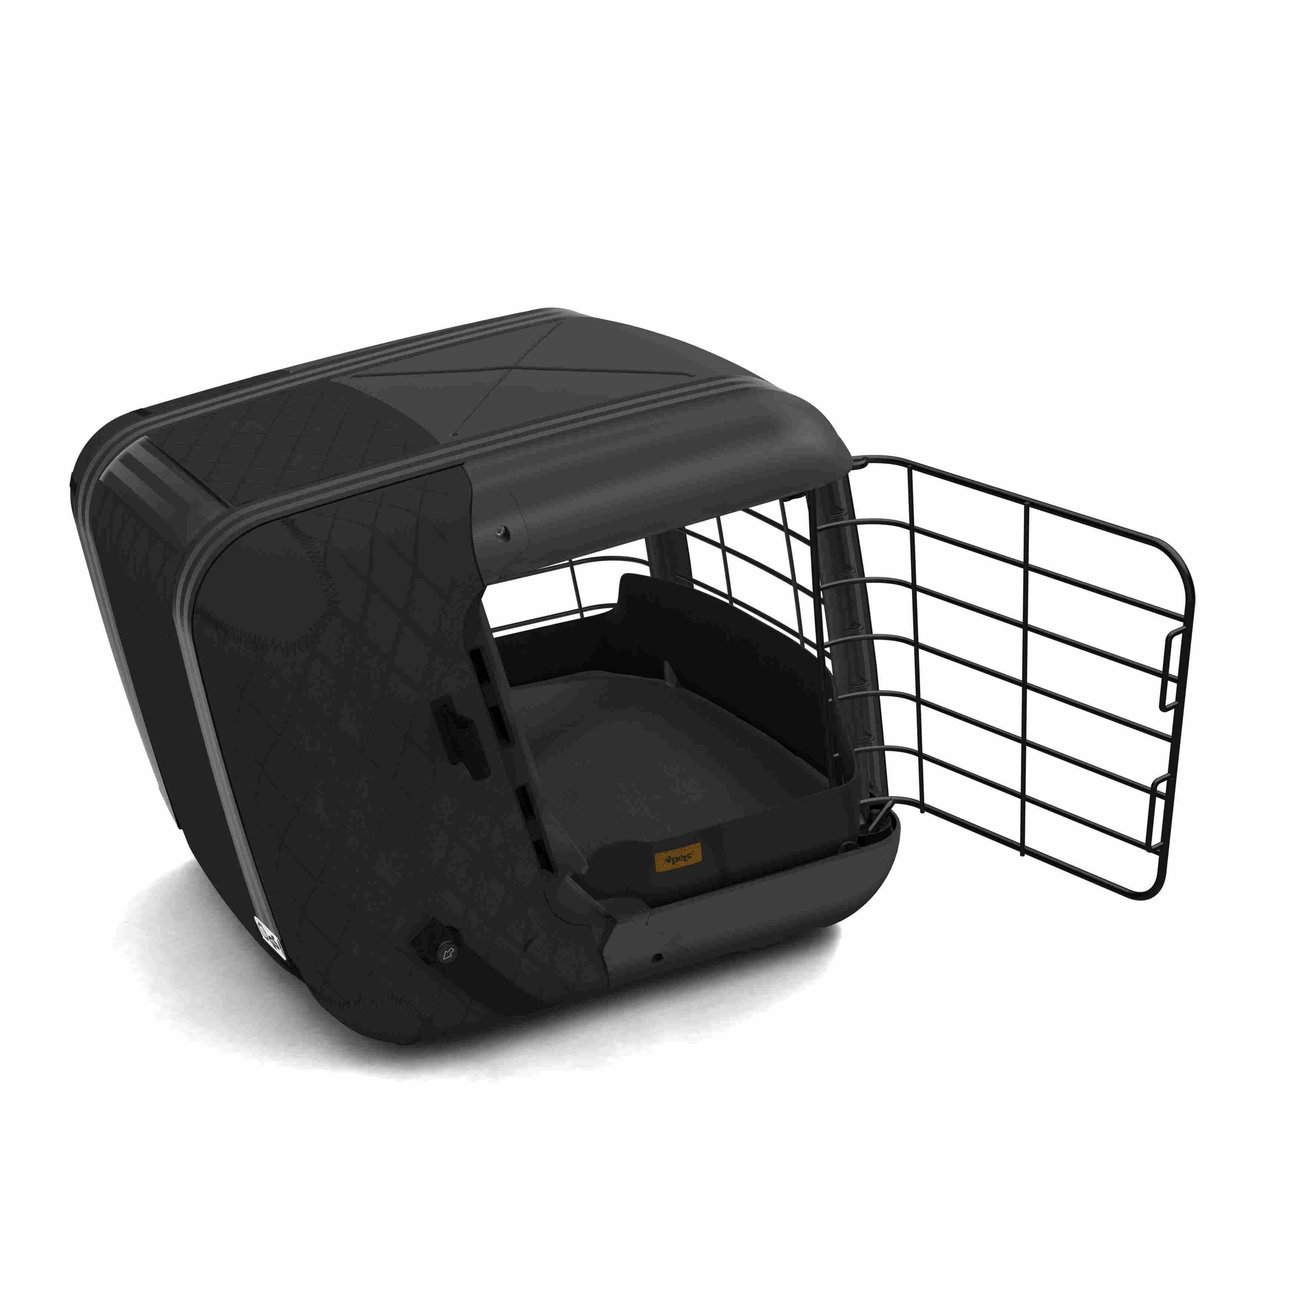 4pets Dog Caree Hundebox Transportbox für Hunde, Bild 10